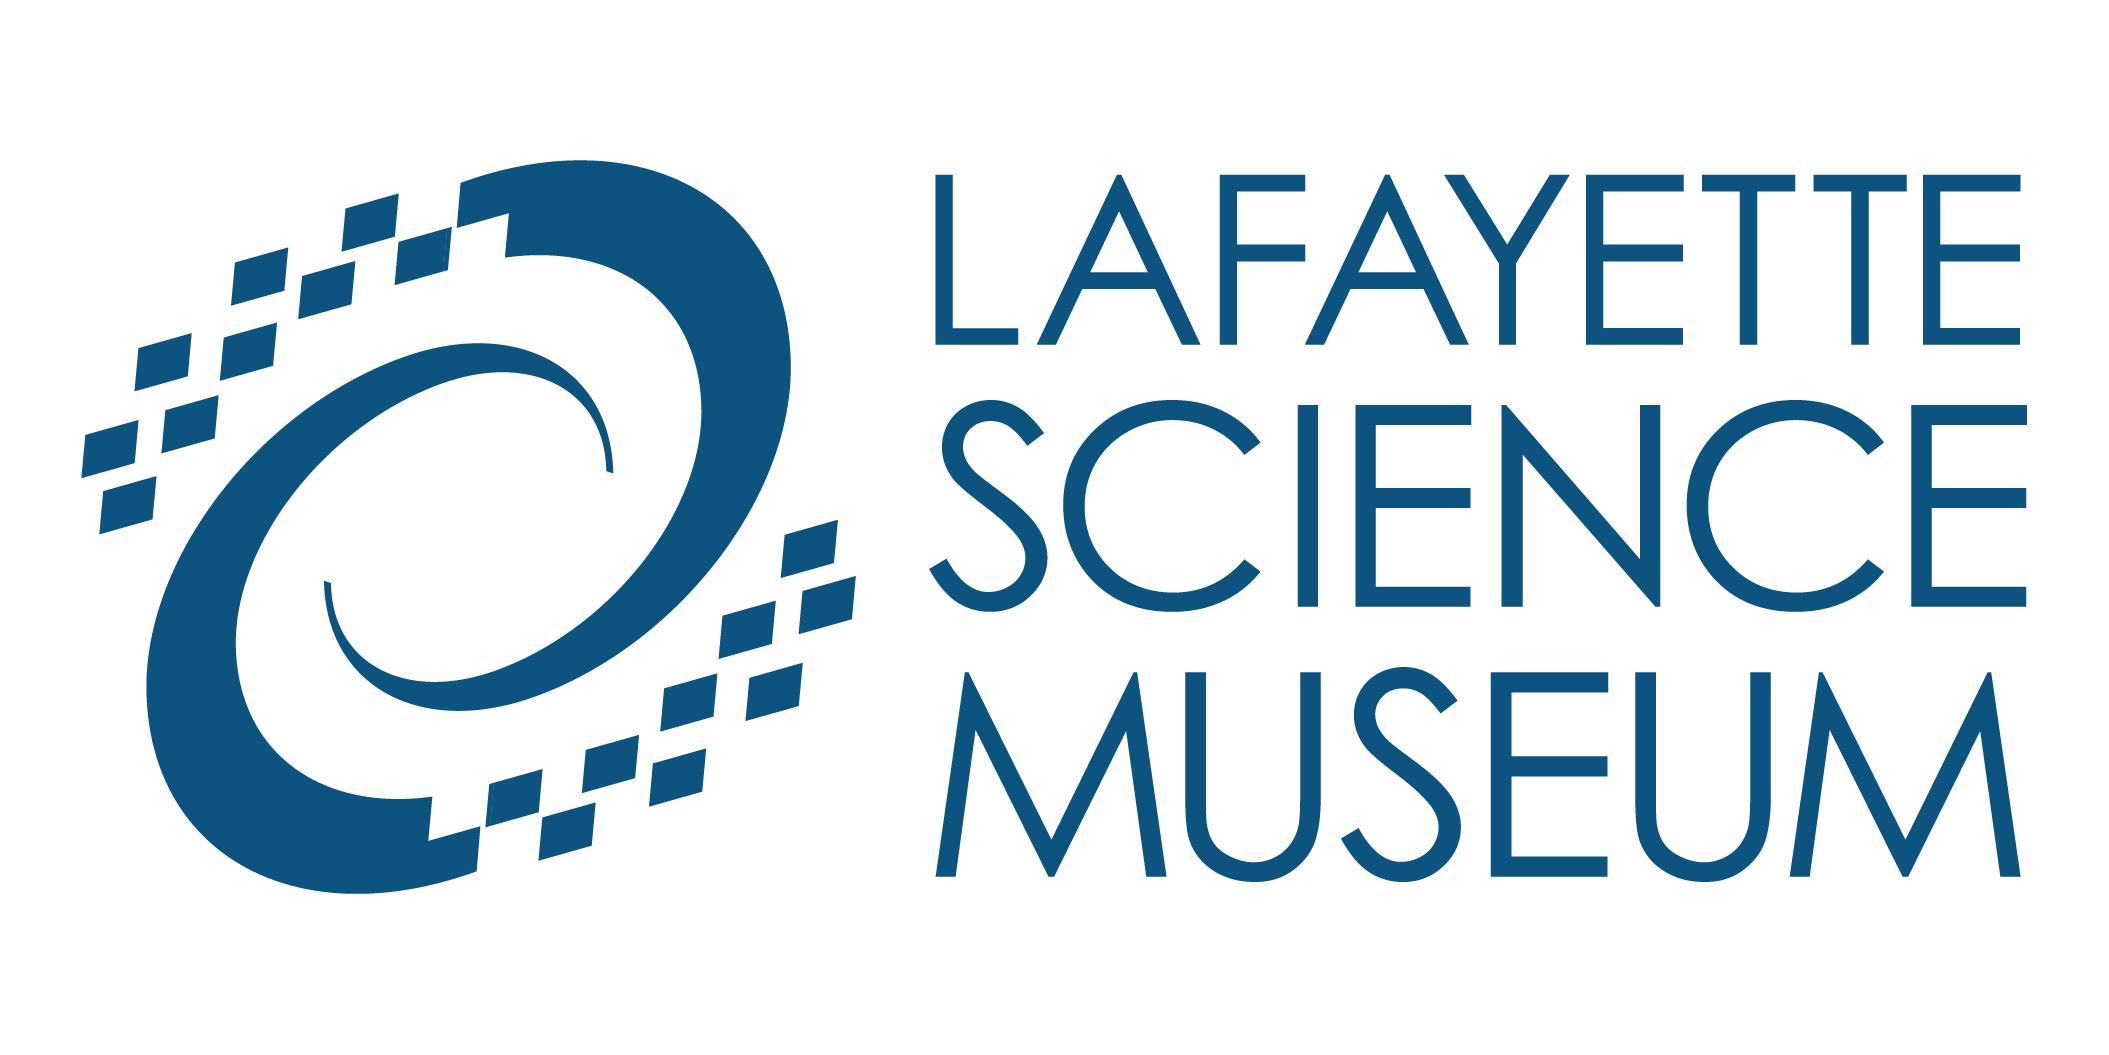 LSM logo_1553865097819.png.jpg